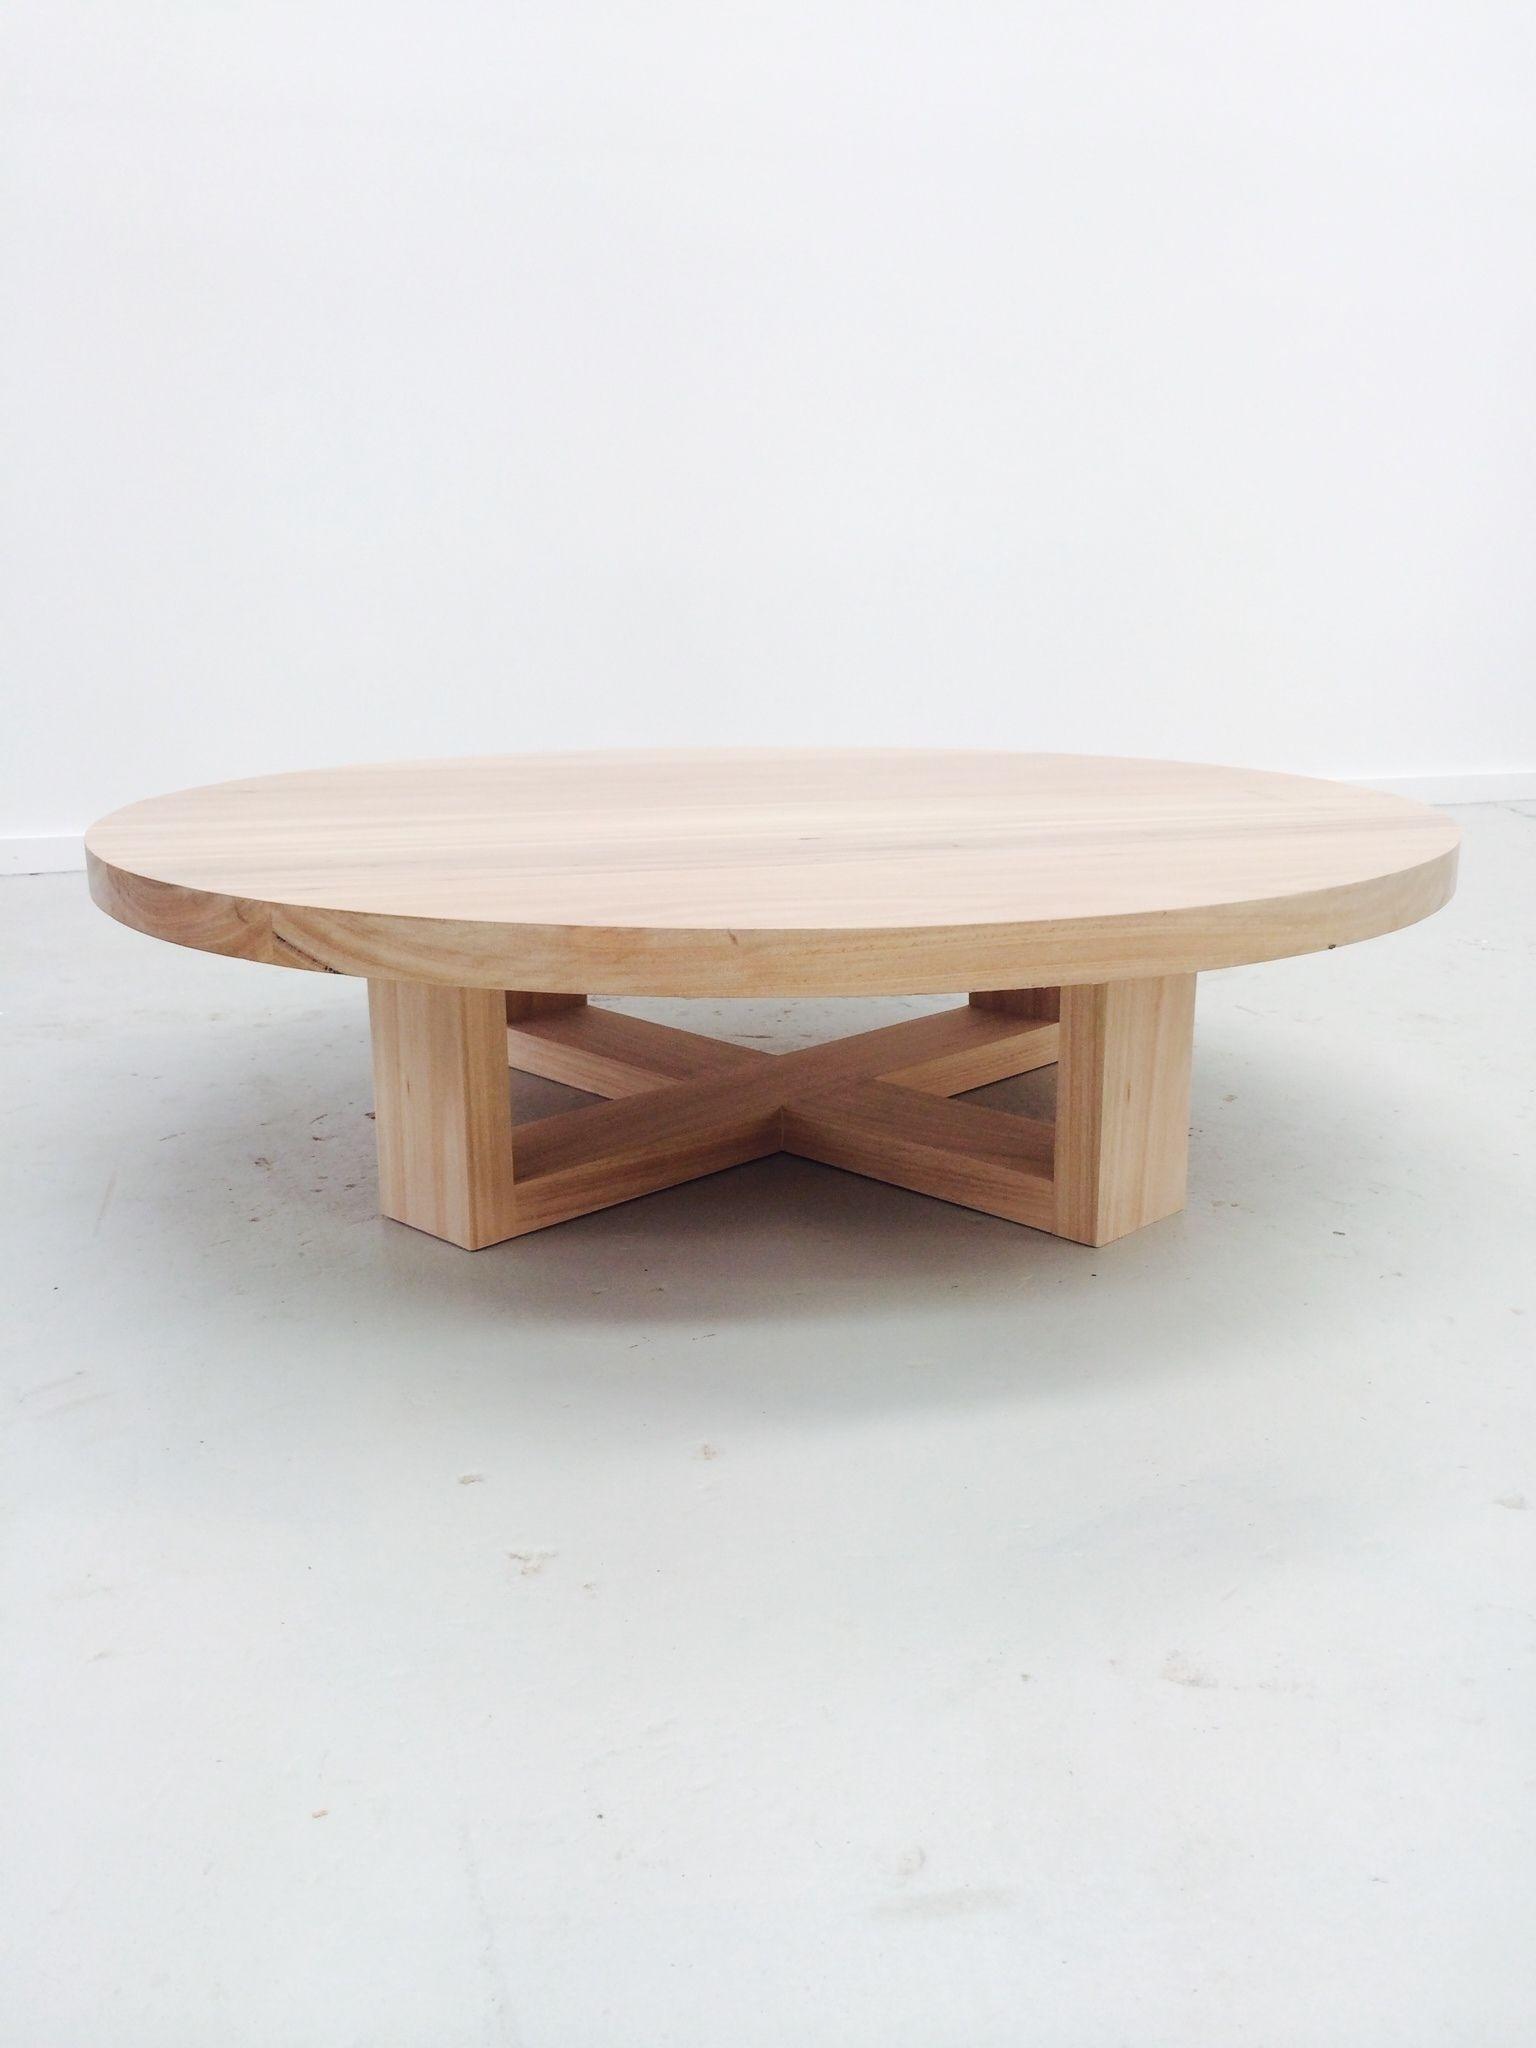 Cb2 Big Dipper Arc Floor Lamp Elegant Mark Tuckey American Oak pertaining to Joni Brass and Wood Coffee Tables (Image 12 of 30)